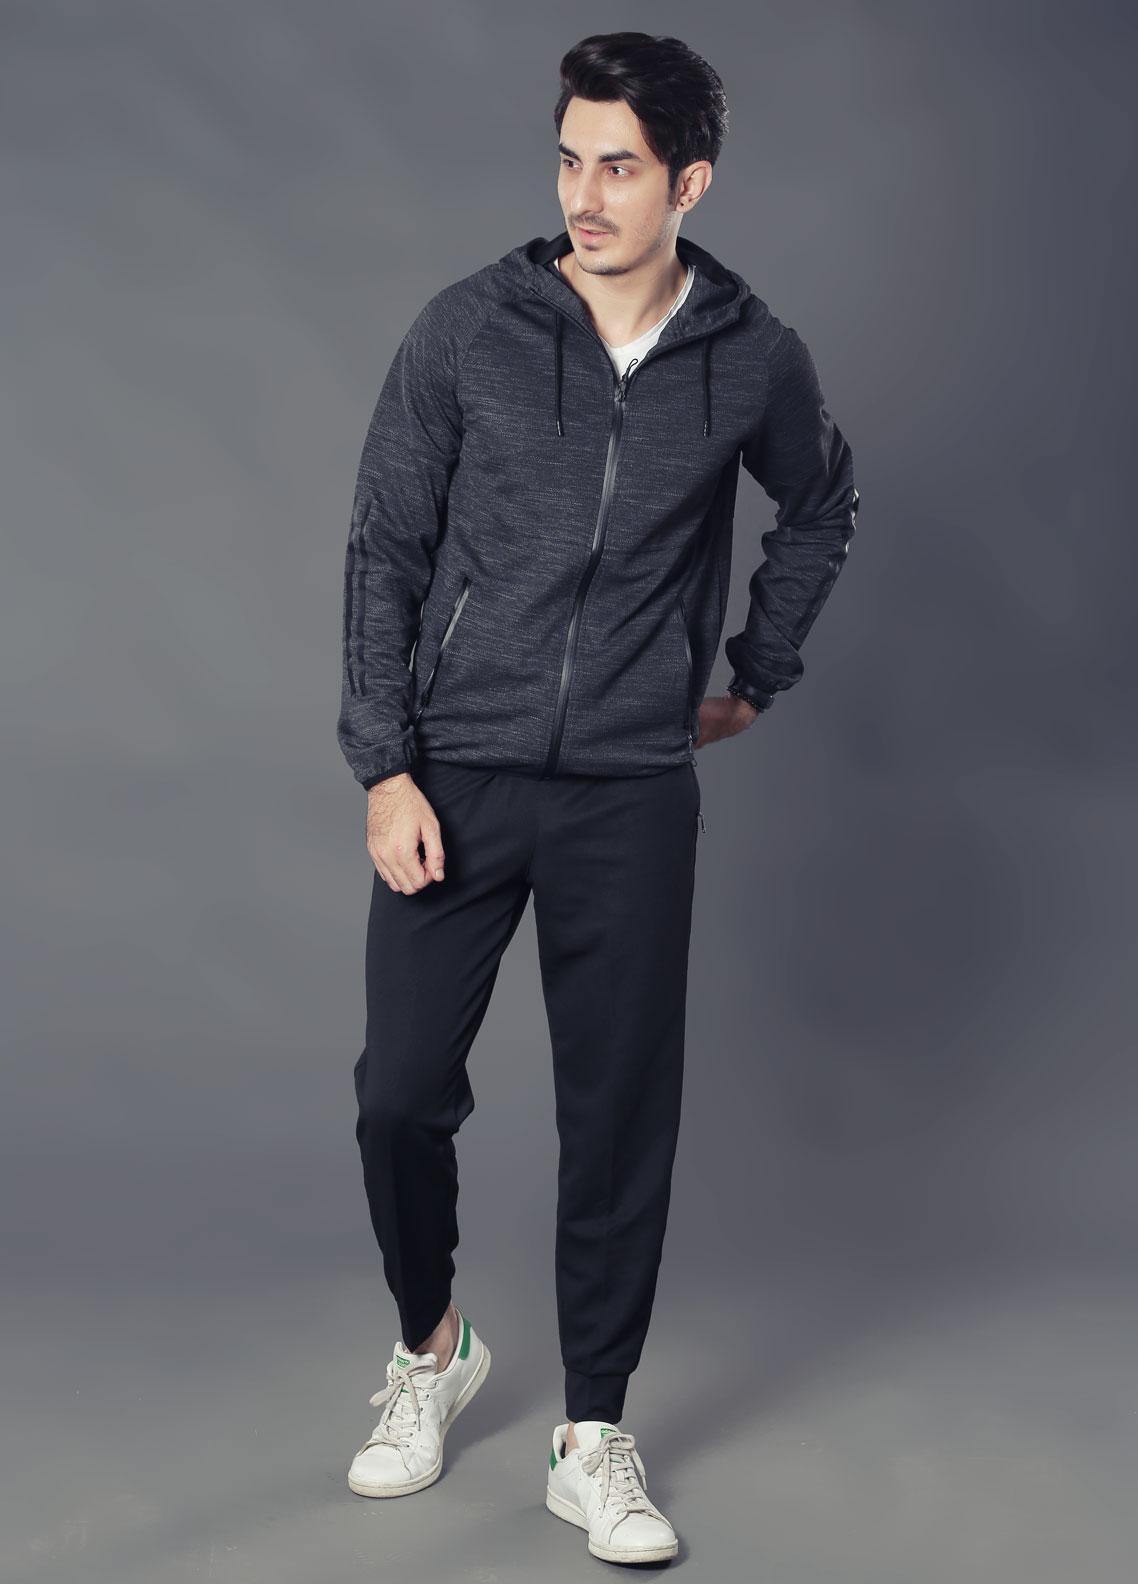 Sanaulla Exclusive Range Premium Jersey Track Men Suits -  19-89556 Dark Grey